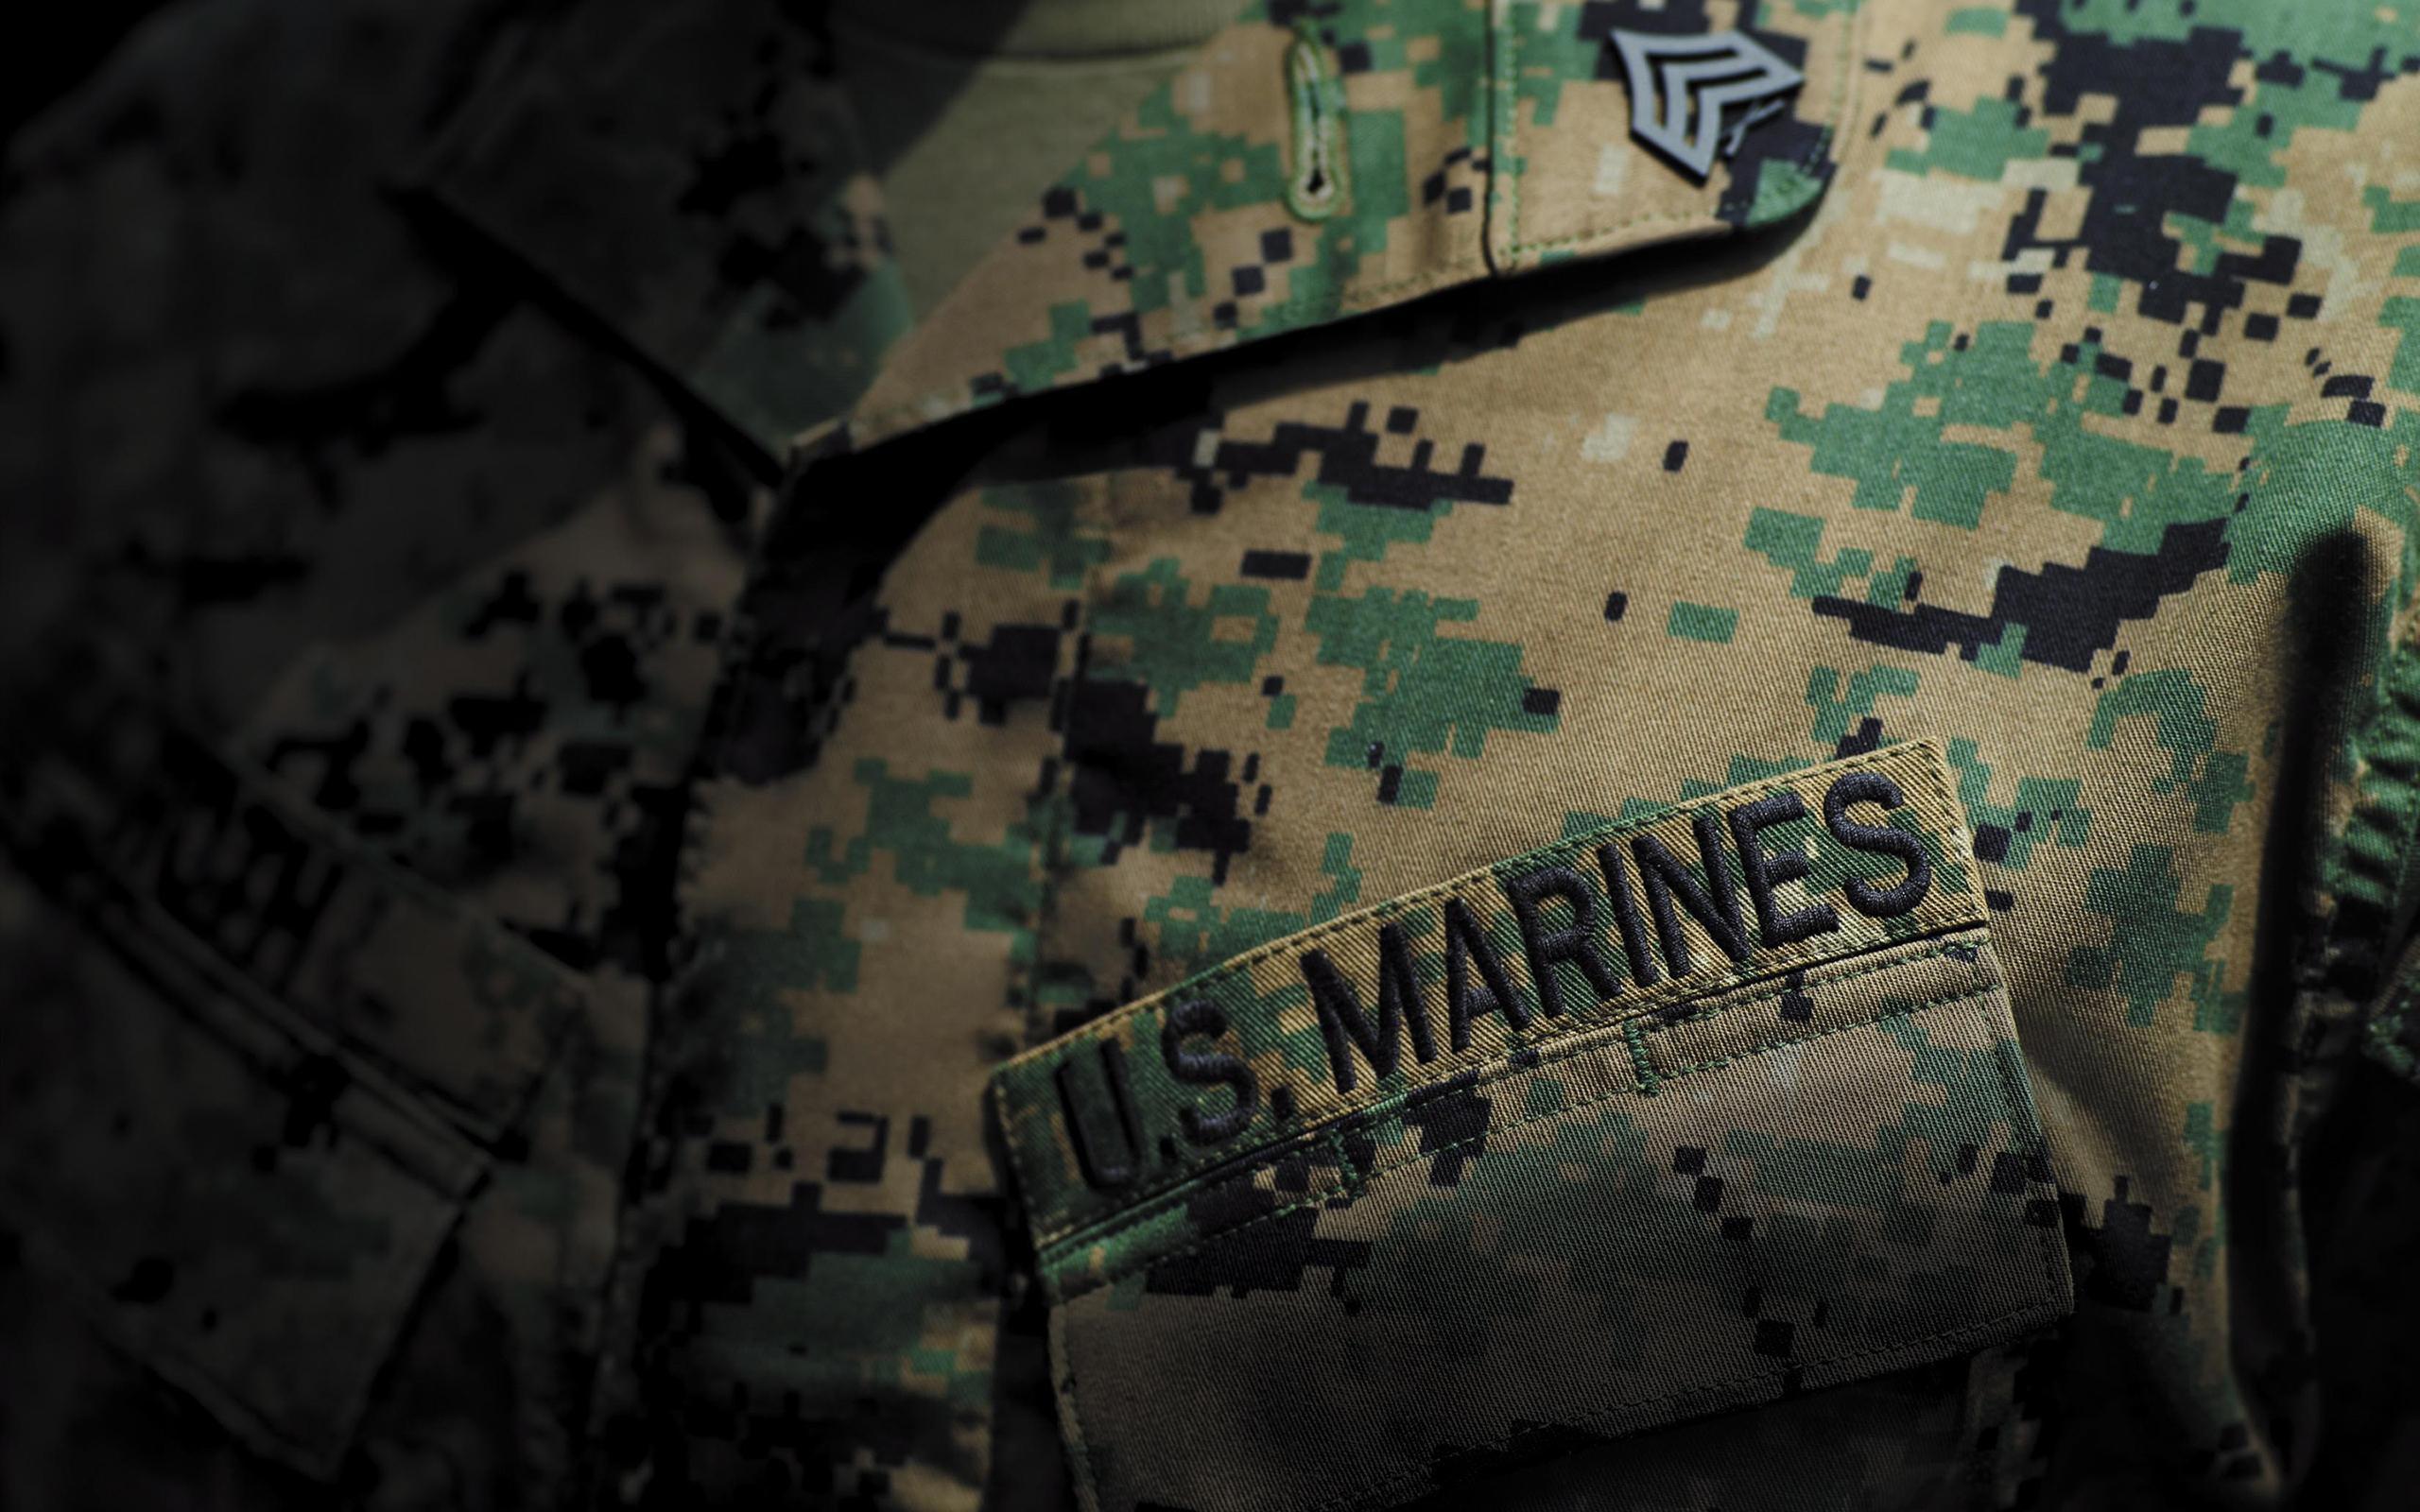 Uniform Camouflage Marines military wallpaper 2560x1600 46812 2560x1600